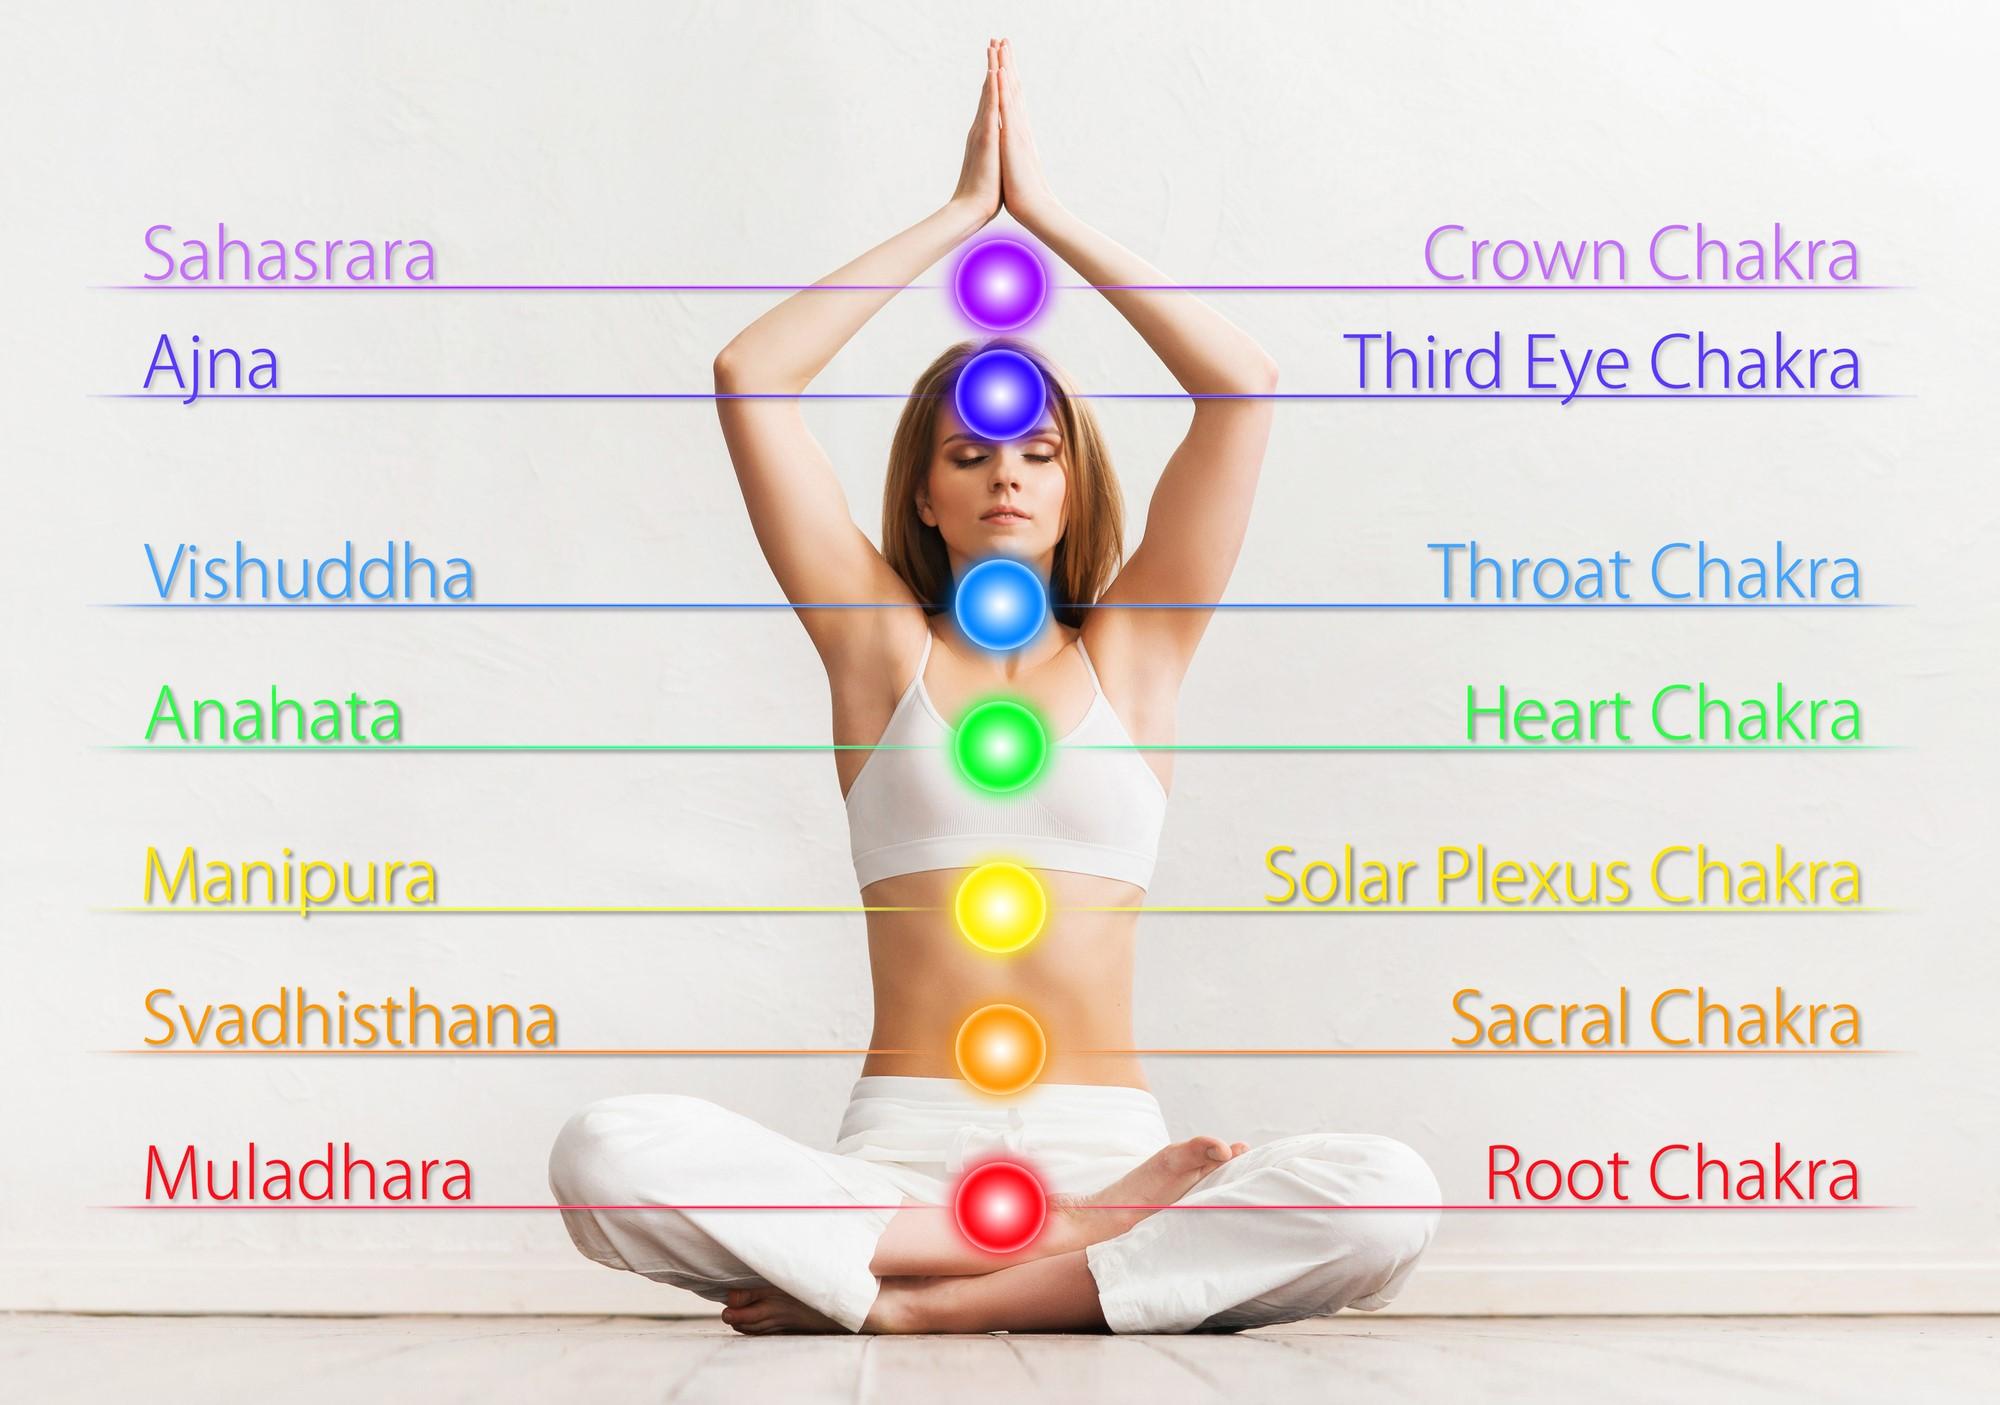 Centrii energetici stimulati prin aromaterapie